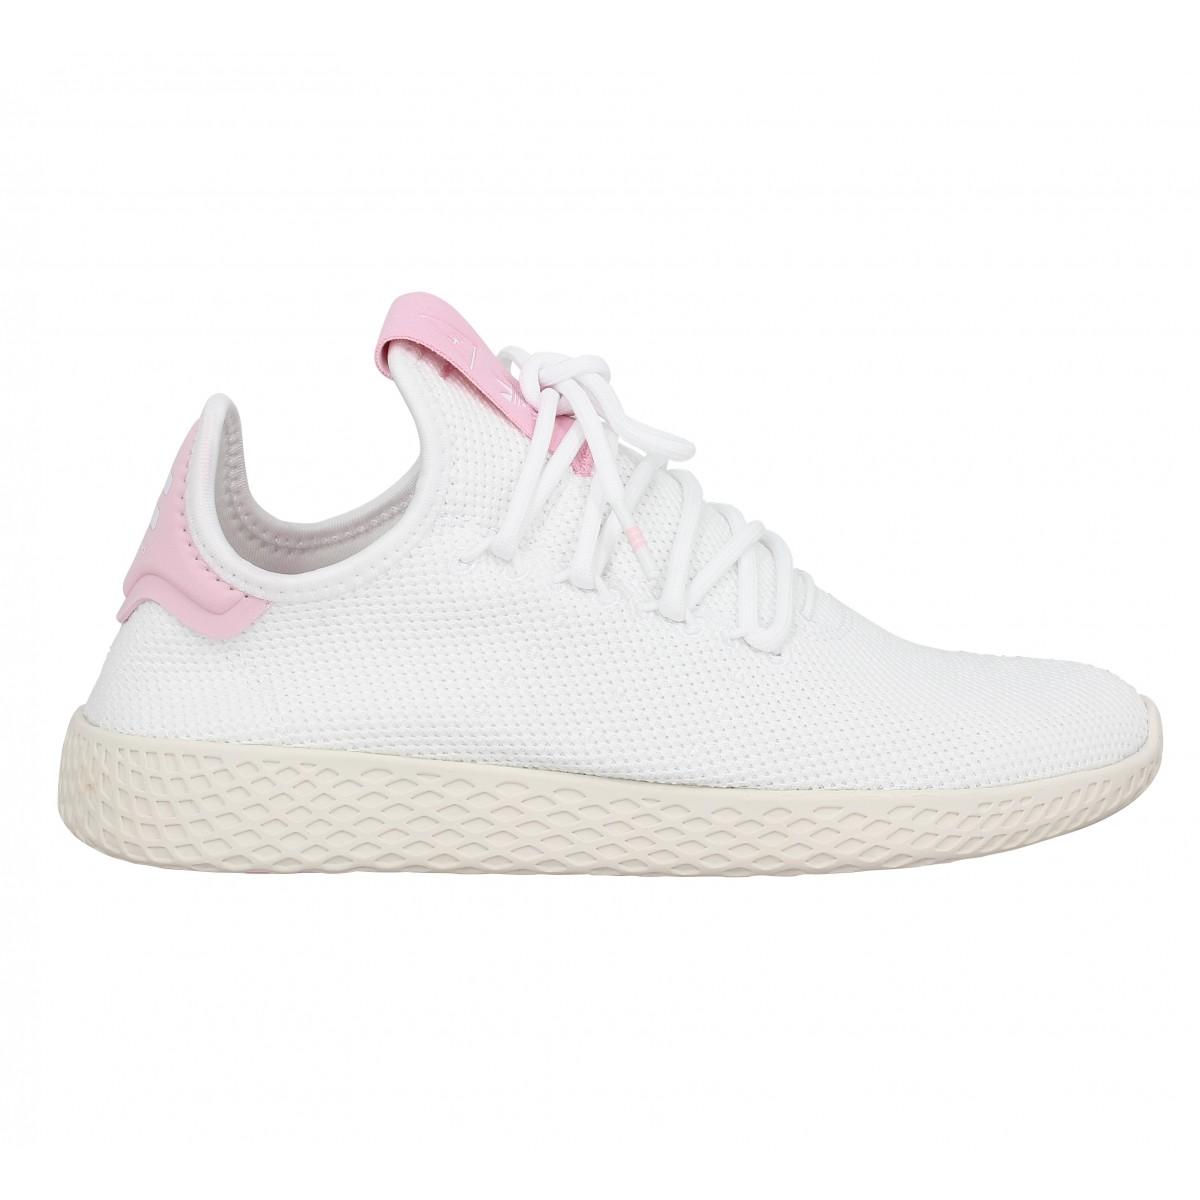 Basket Blanche Adidas Femme